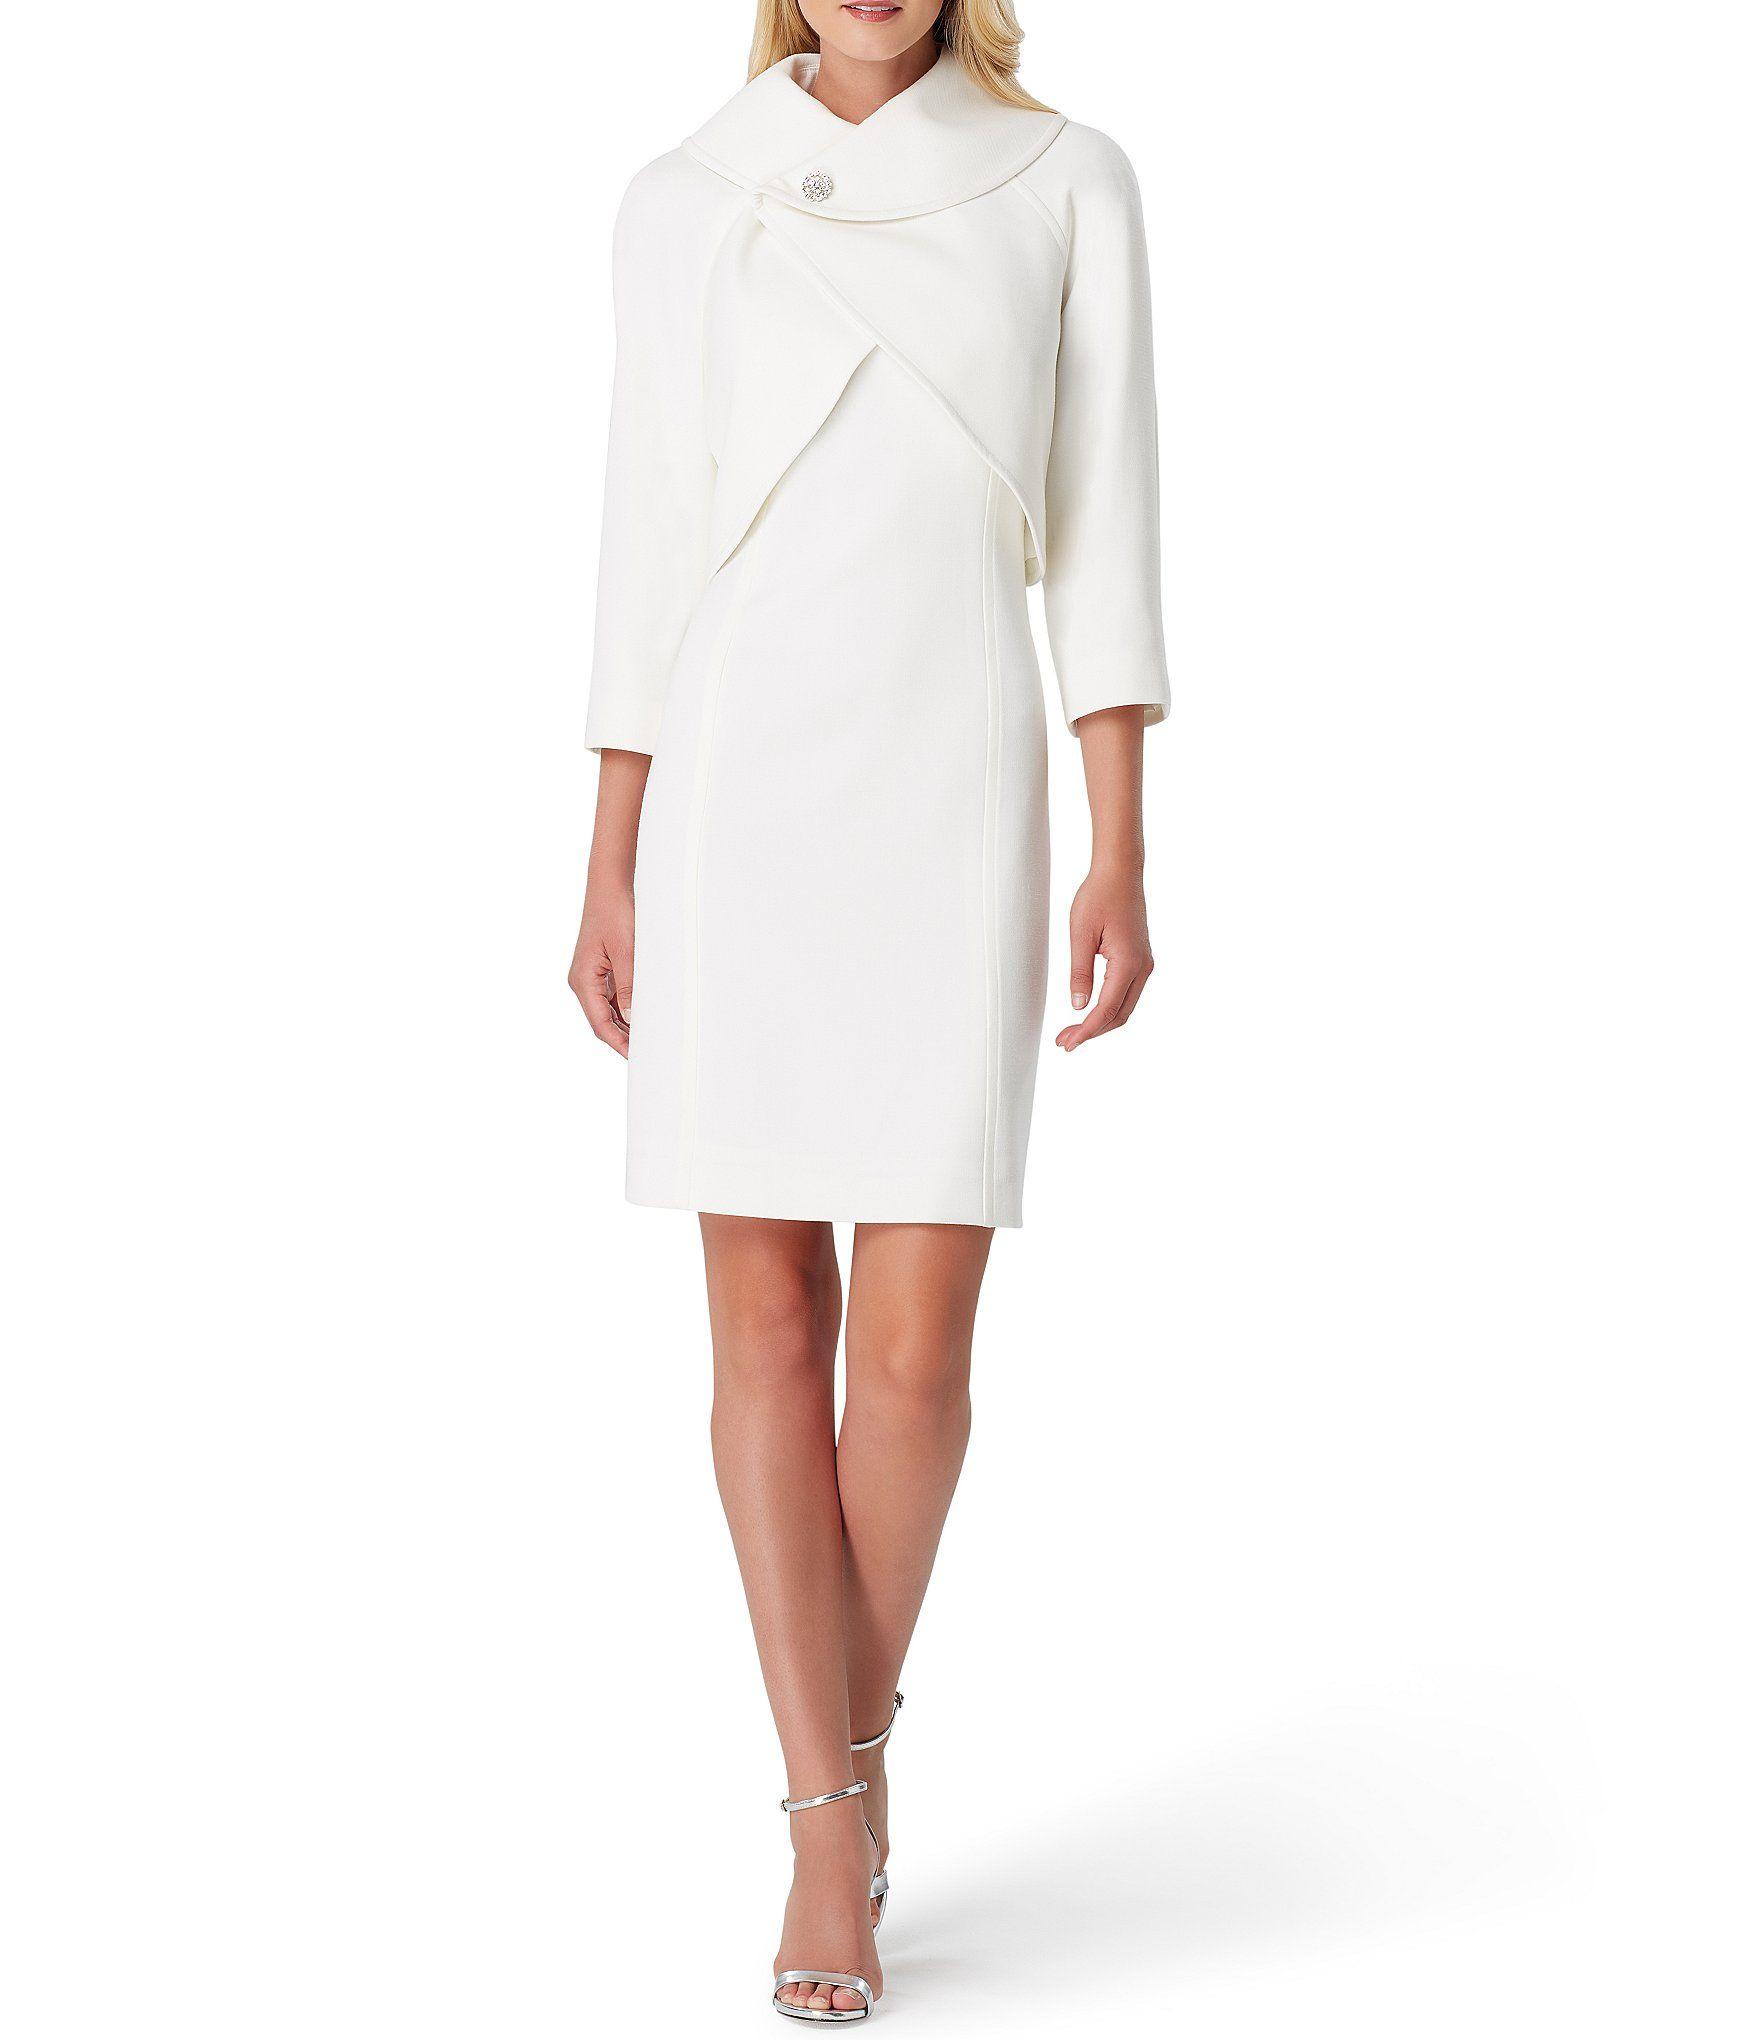 Shop For Tahari Asl Scuba Crepe Envelope Collar Embellished Button Jacket 2 Piece Dress Suit At Dillards Com Womens Dress Suits Suits For Women Dressy Fashion [ 2040 x 1760 Pixel ]